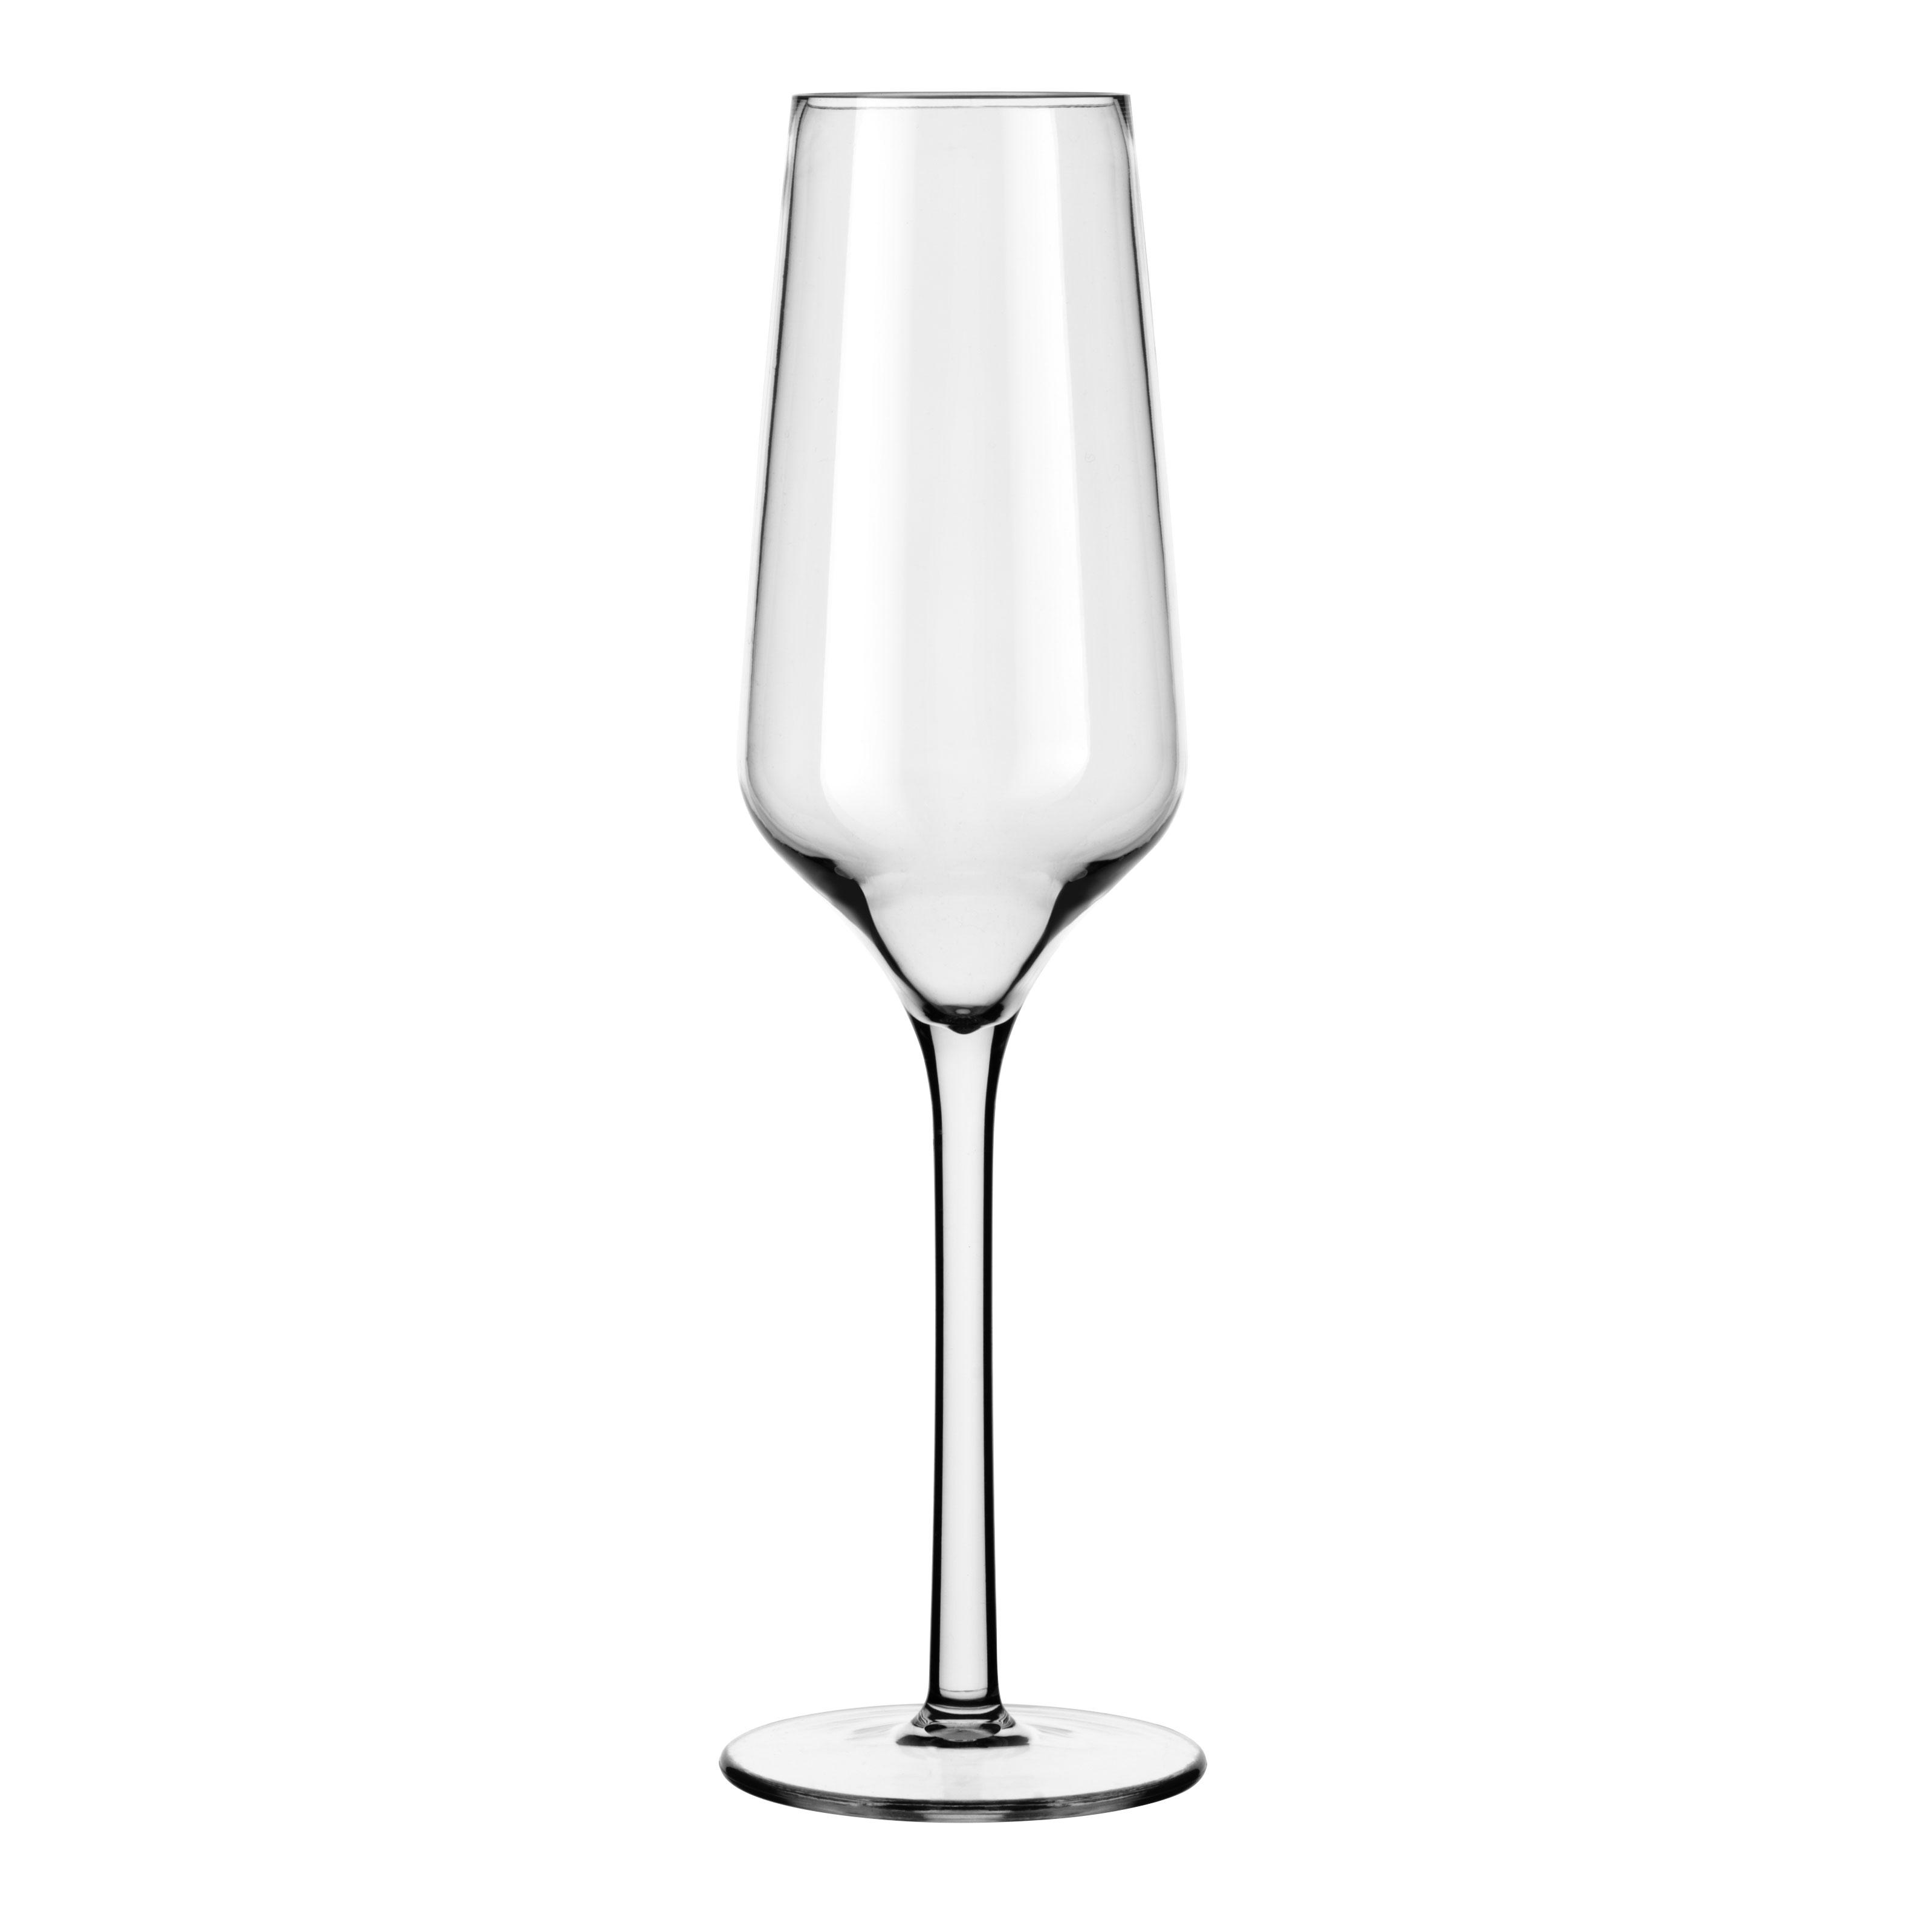 Libbey Glass 92451 glassware, plastic